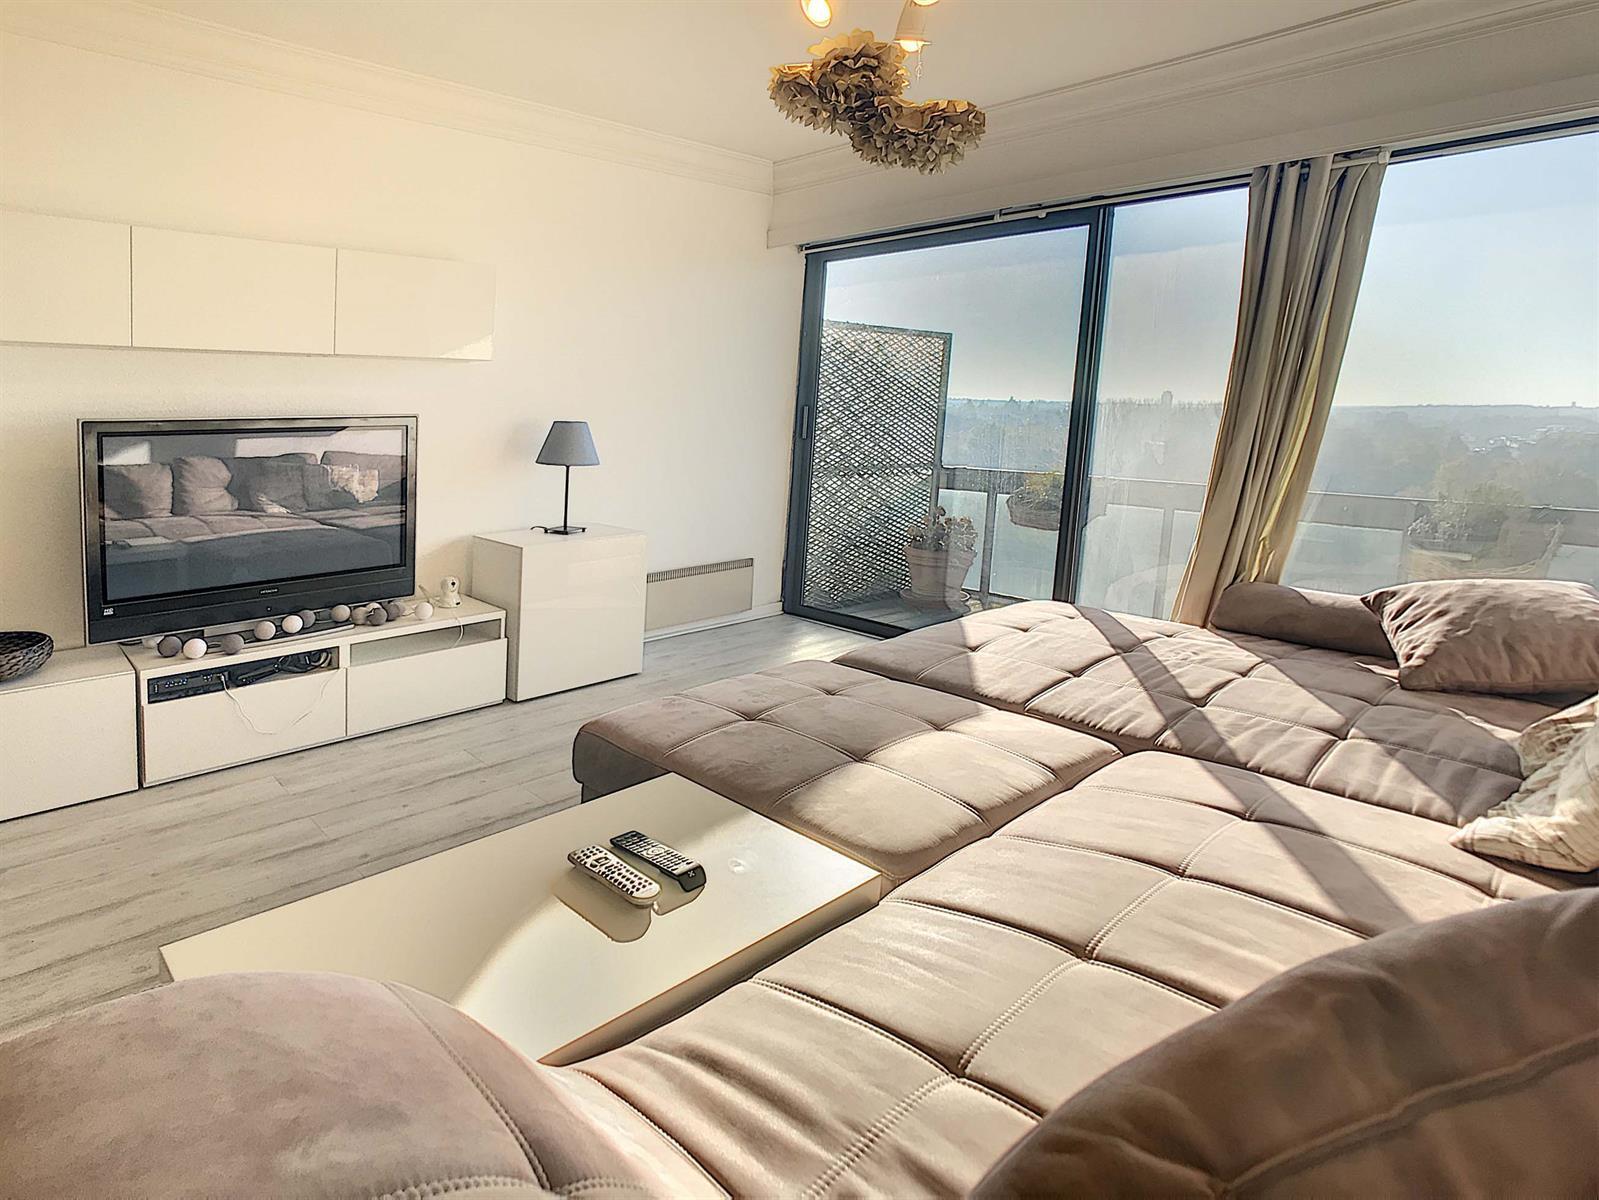 Appartement - Zaventem Sint-Stevens-Woluwe - #4218075-1